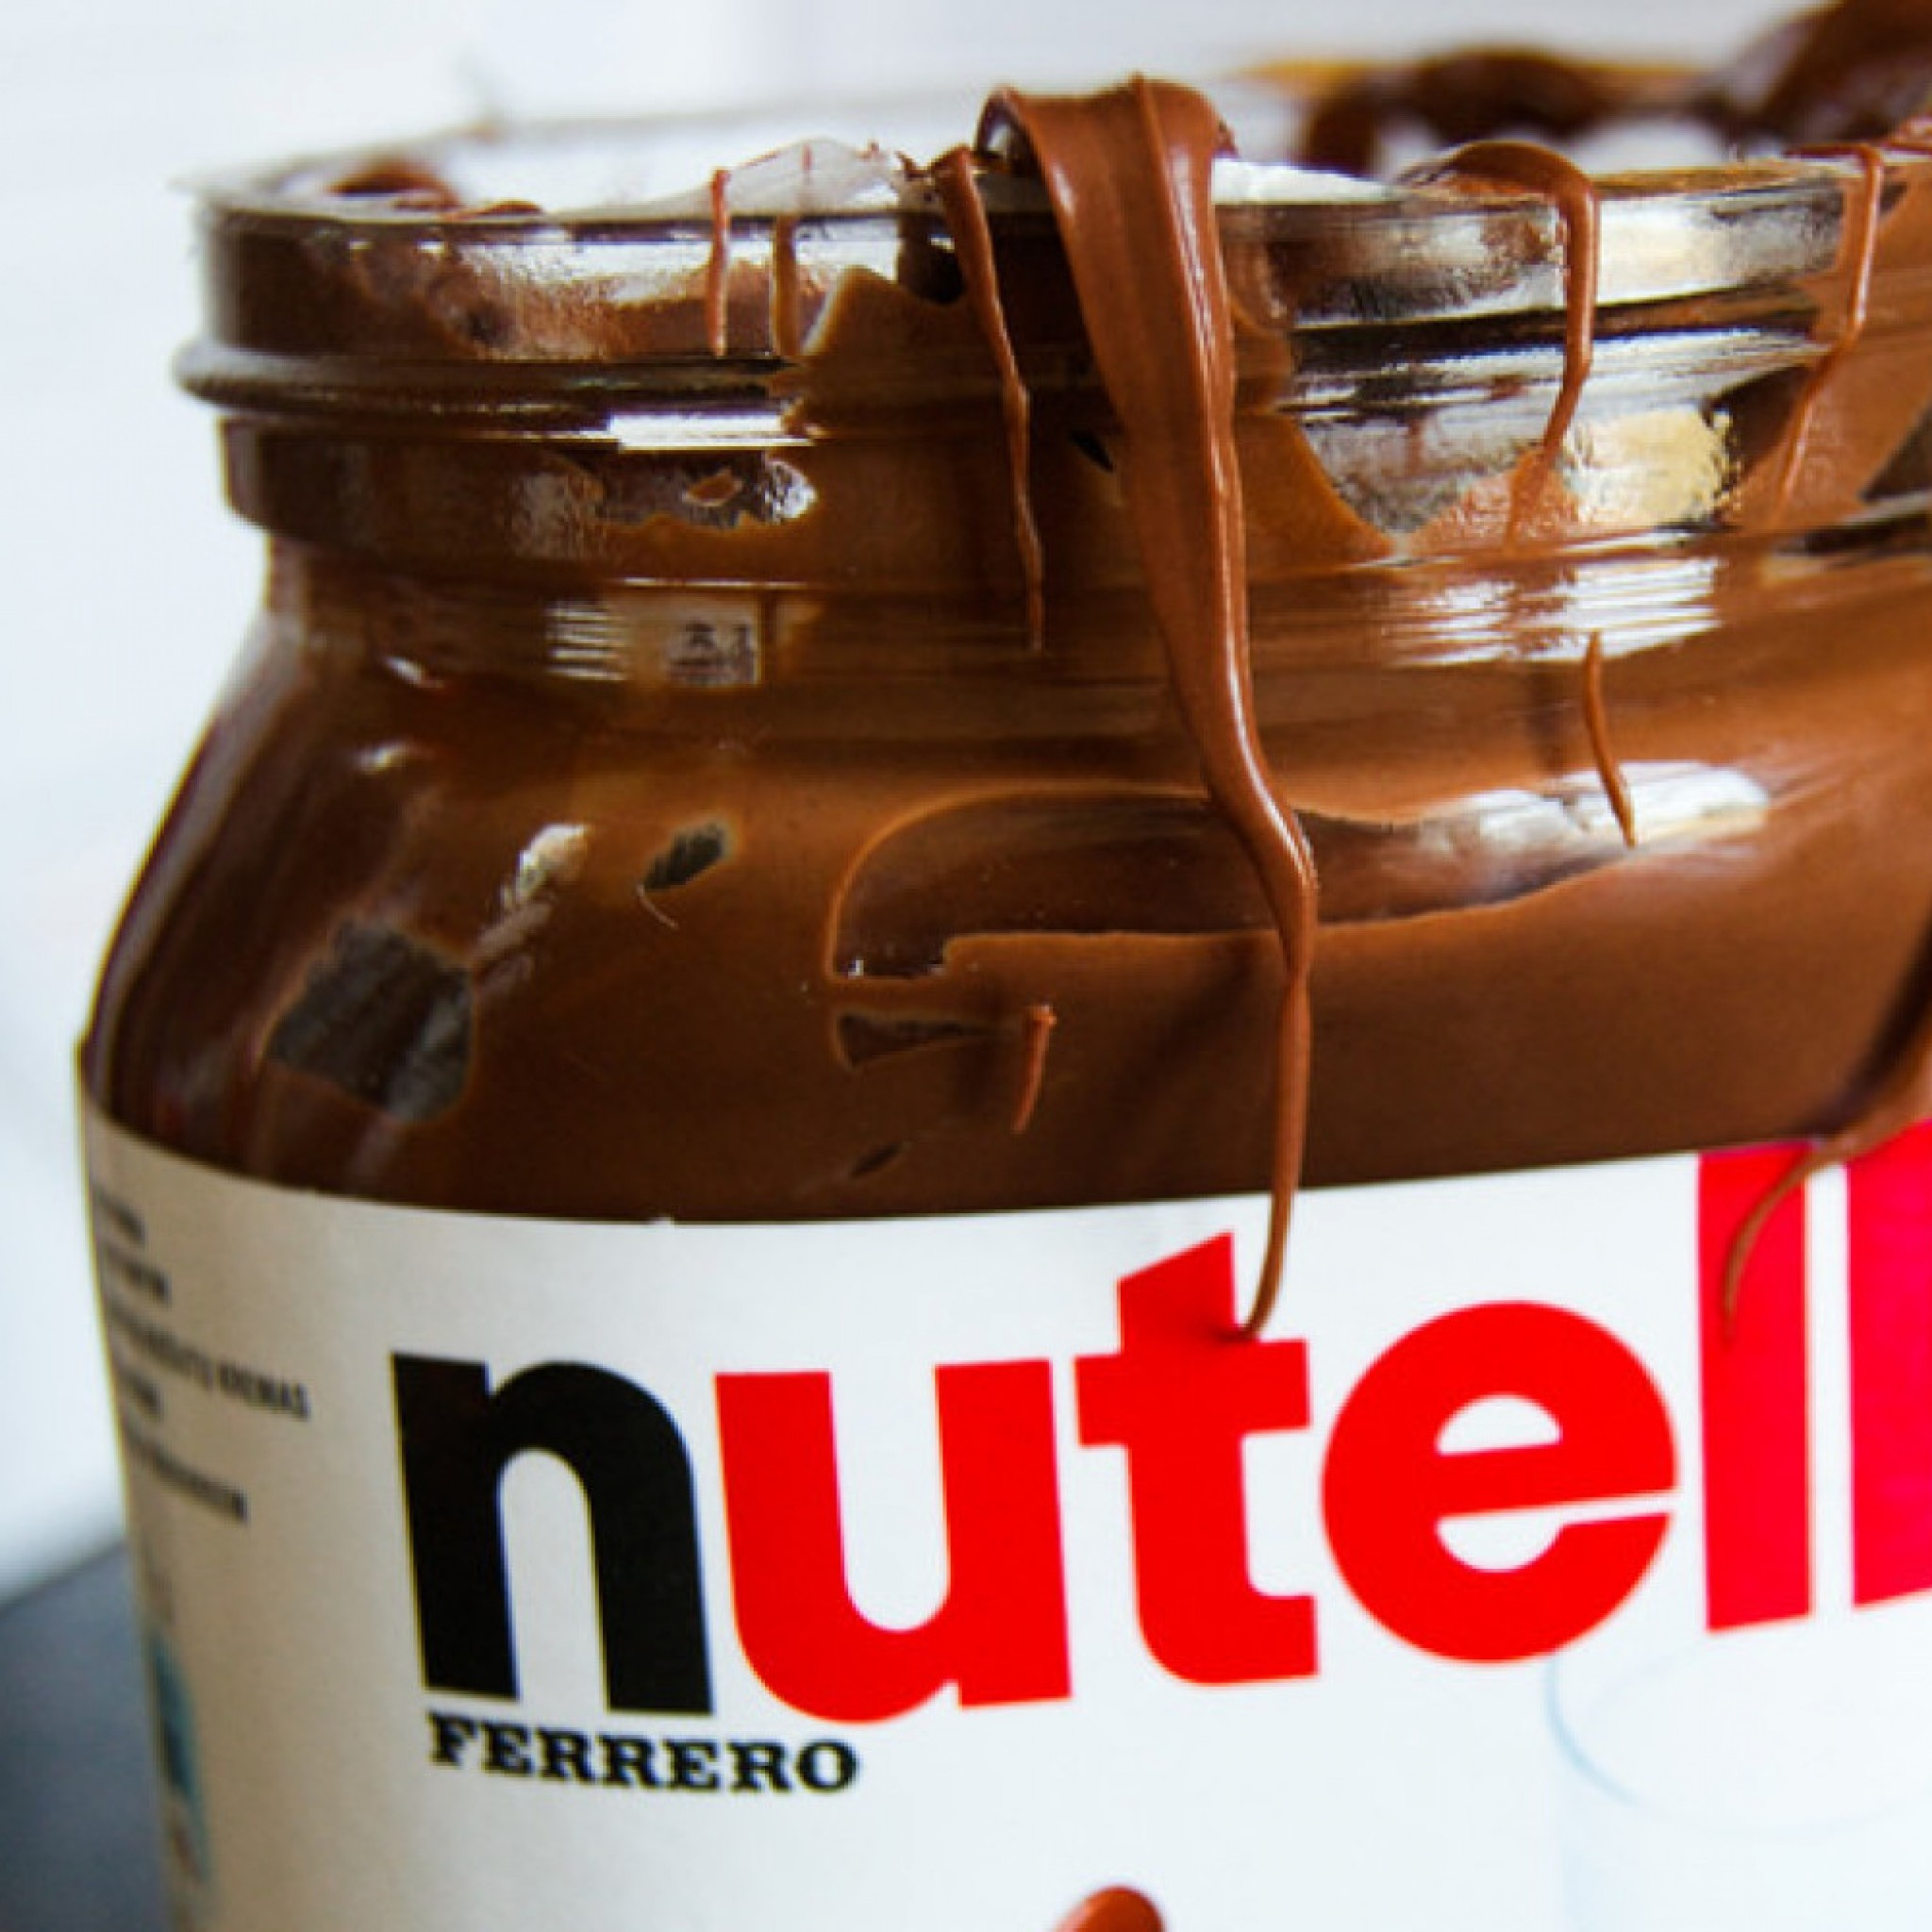 Cute Nutella Wallpapers Nutella Wallpapers 183 ① Wallpapertag